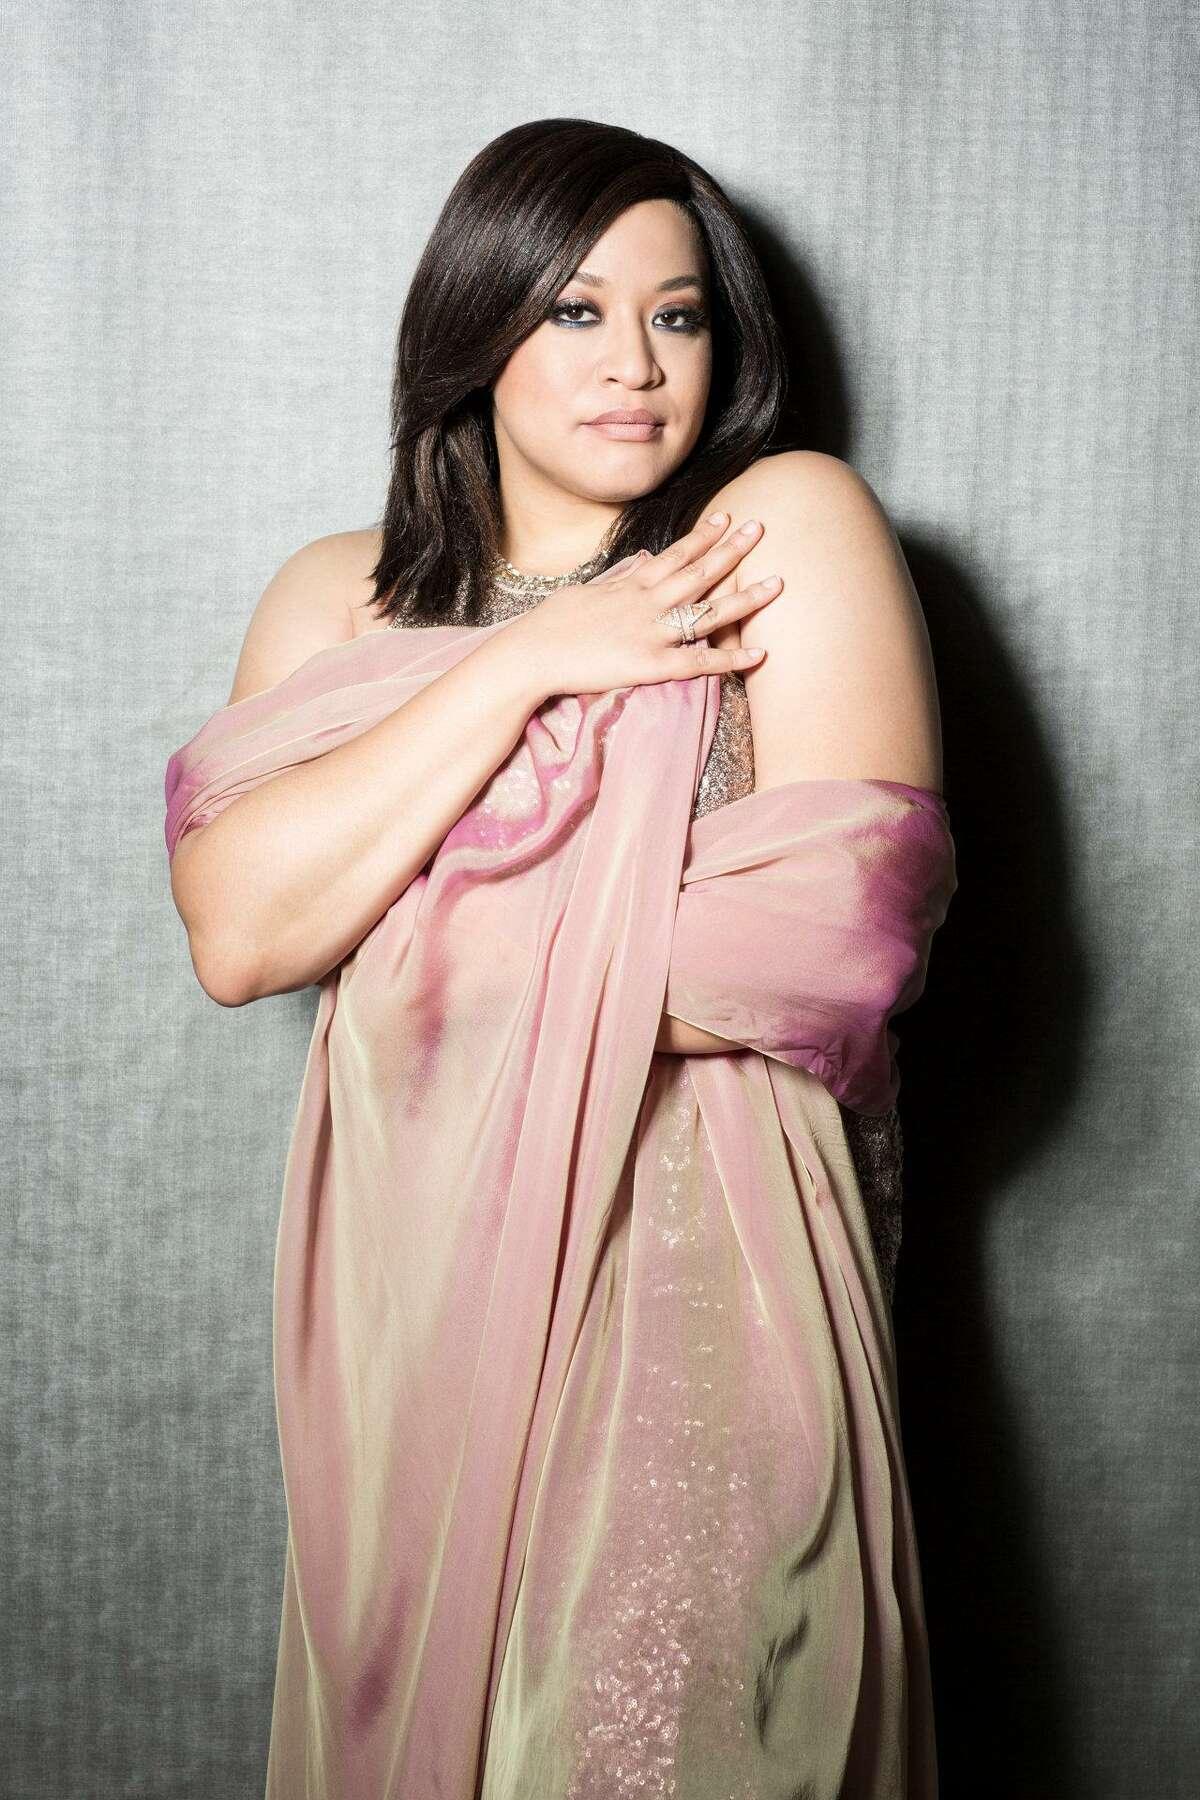 Opera singer Michelle Bradley will perform at Ars Lyrica's virtual gala.